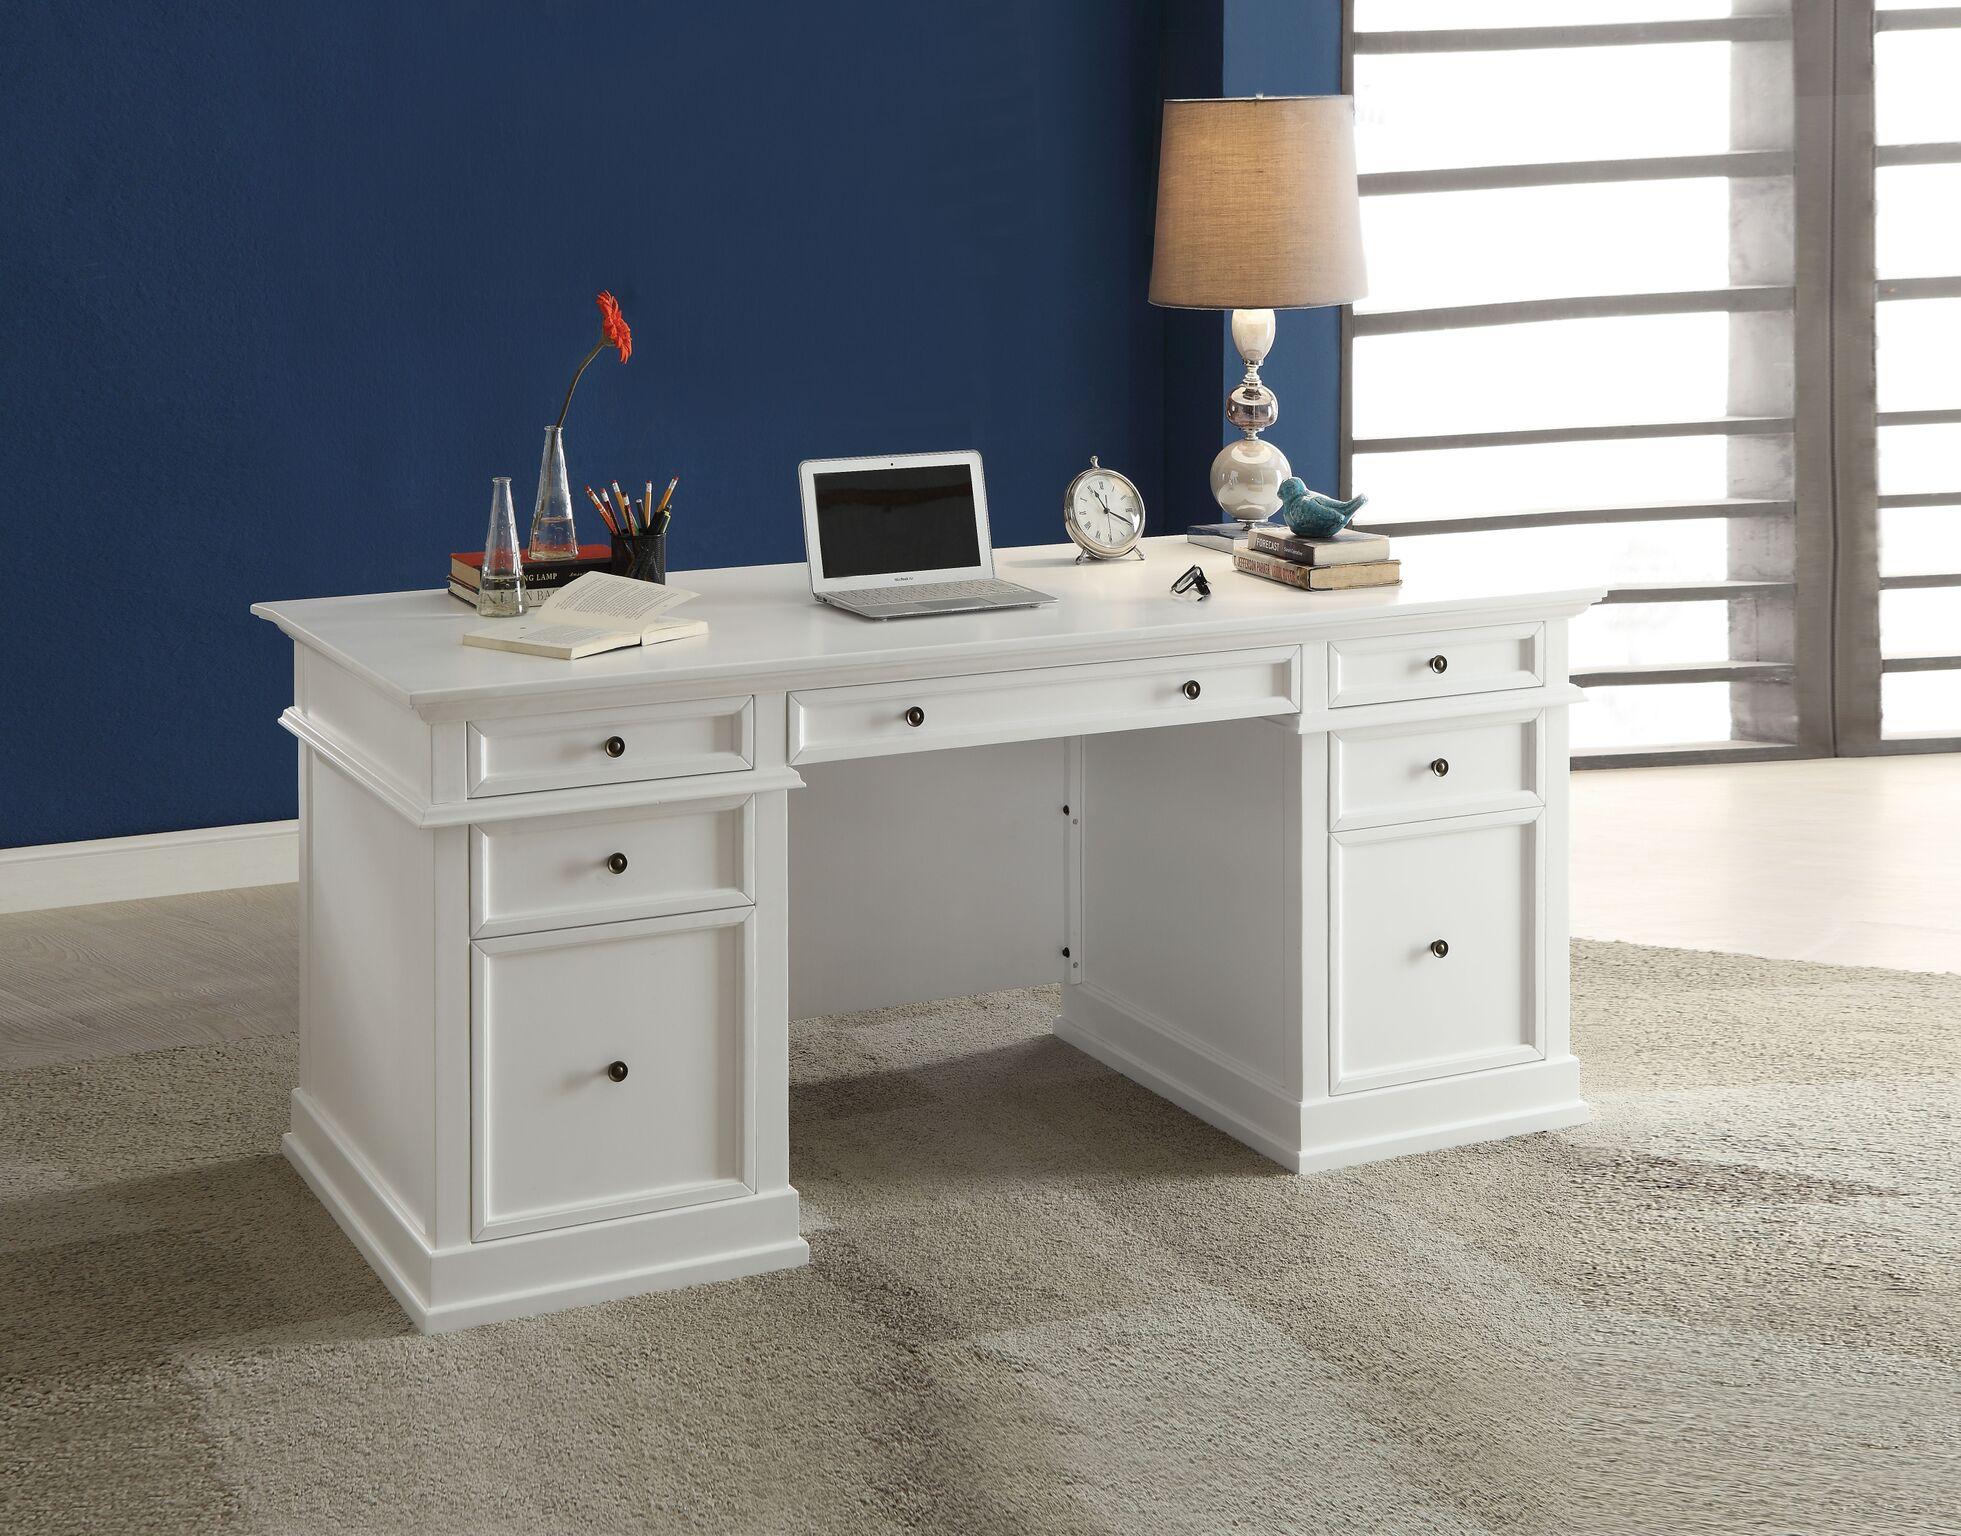 Daiki Desk White Wooden Desk With Drawers & File Cabinet — Casa Bella  Furniture | Quality Furniture & Home Goods